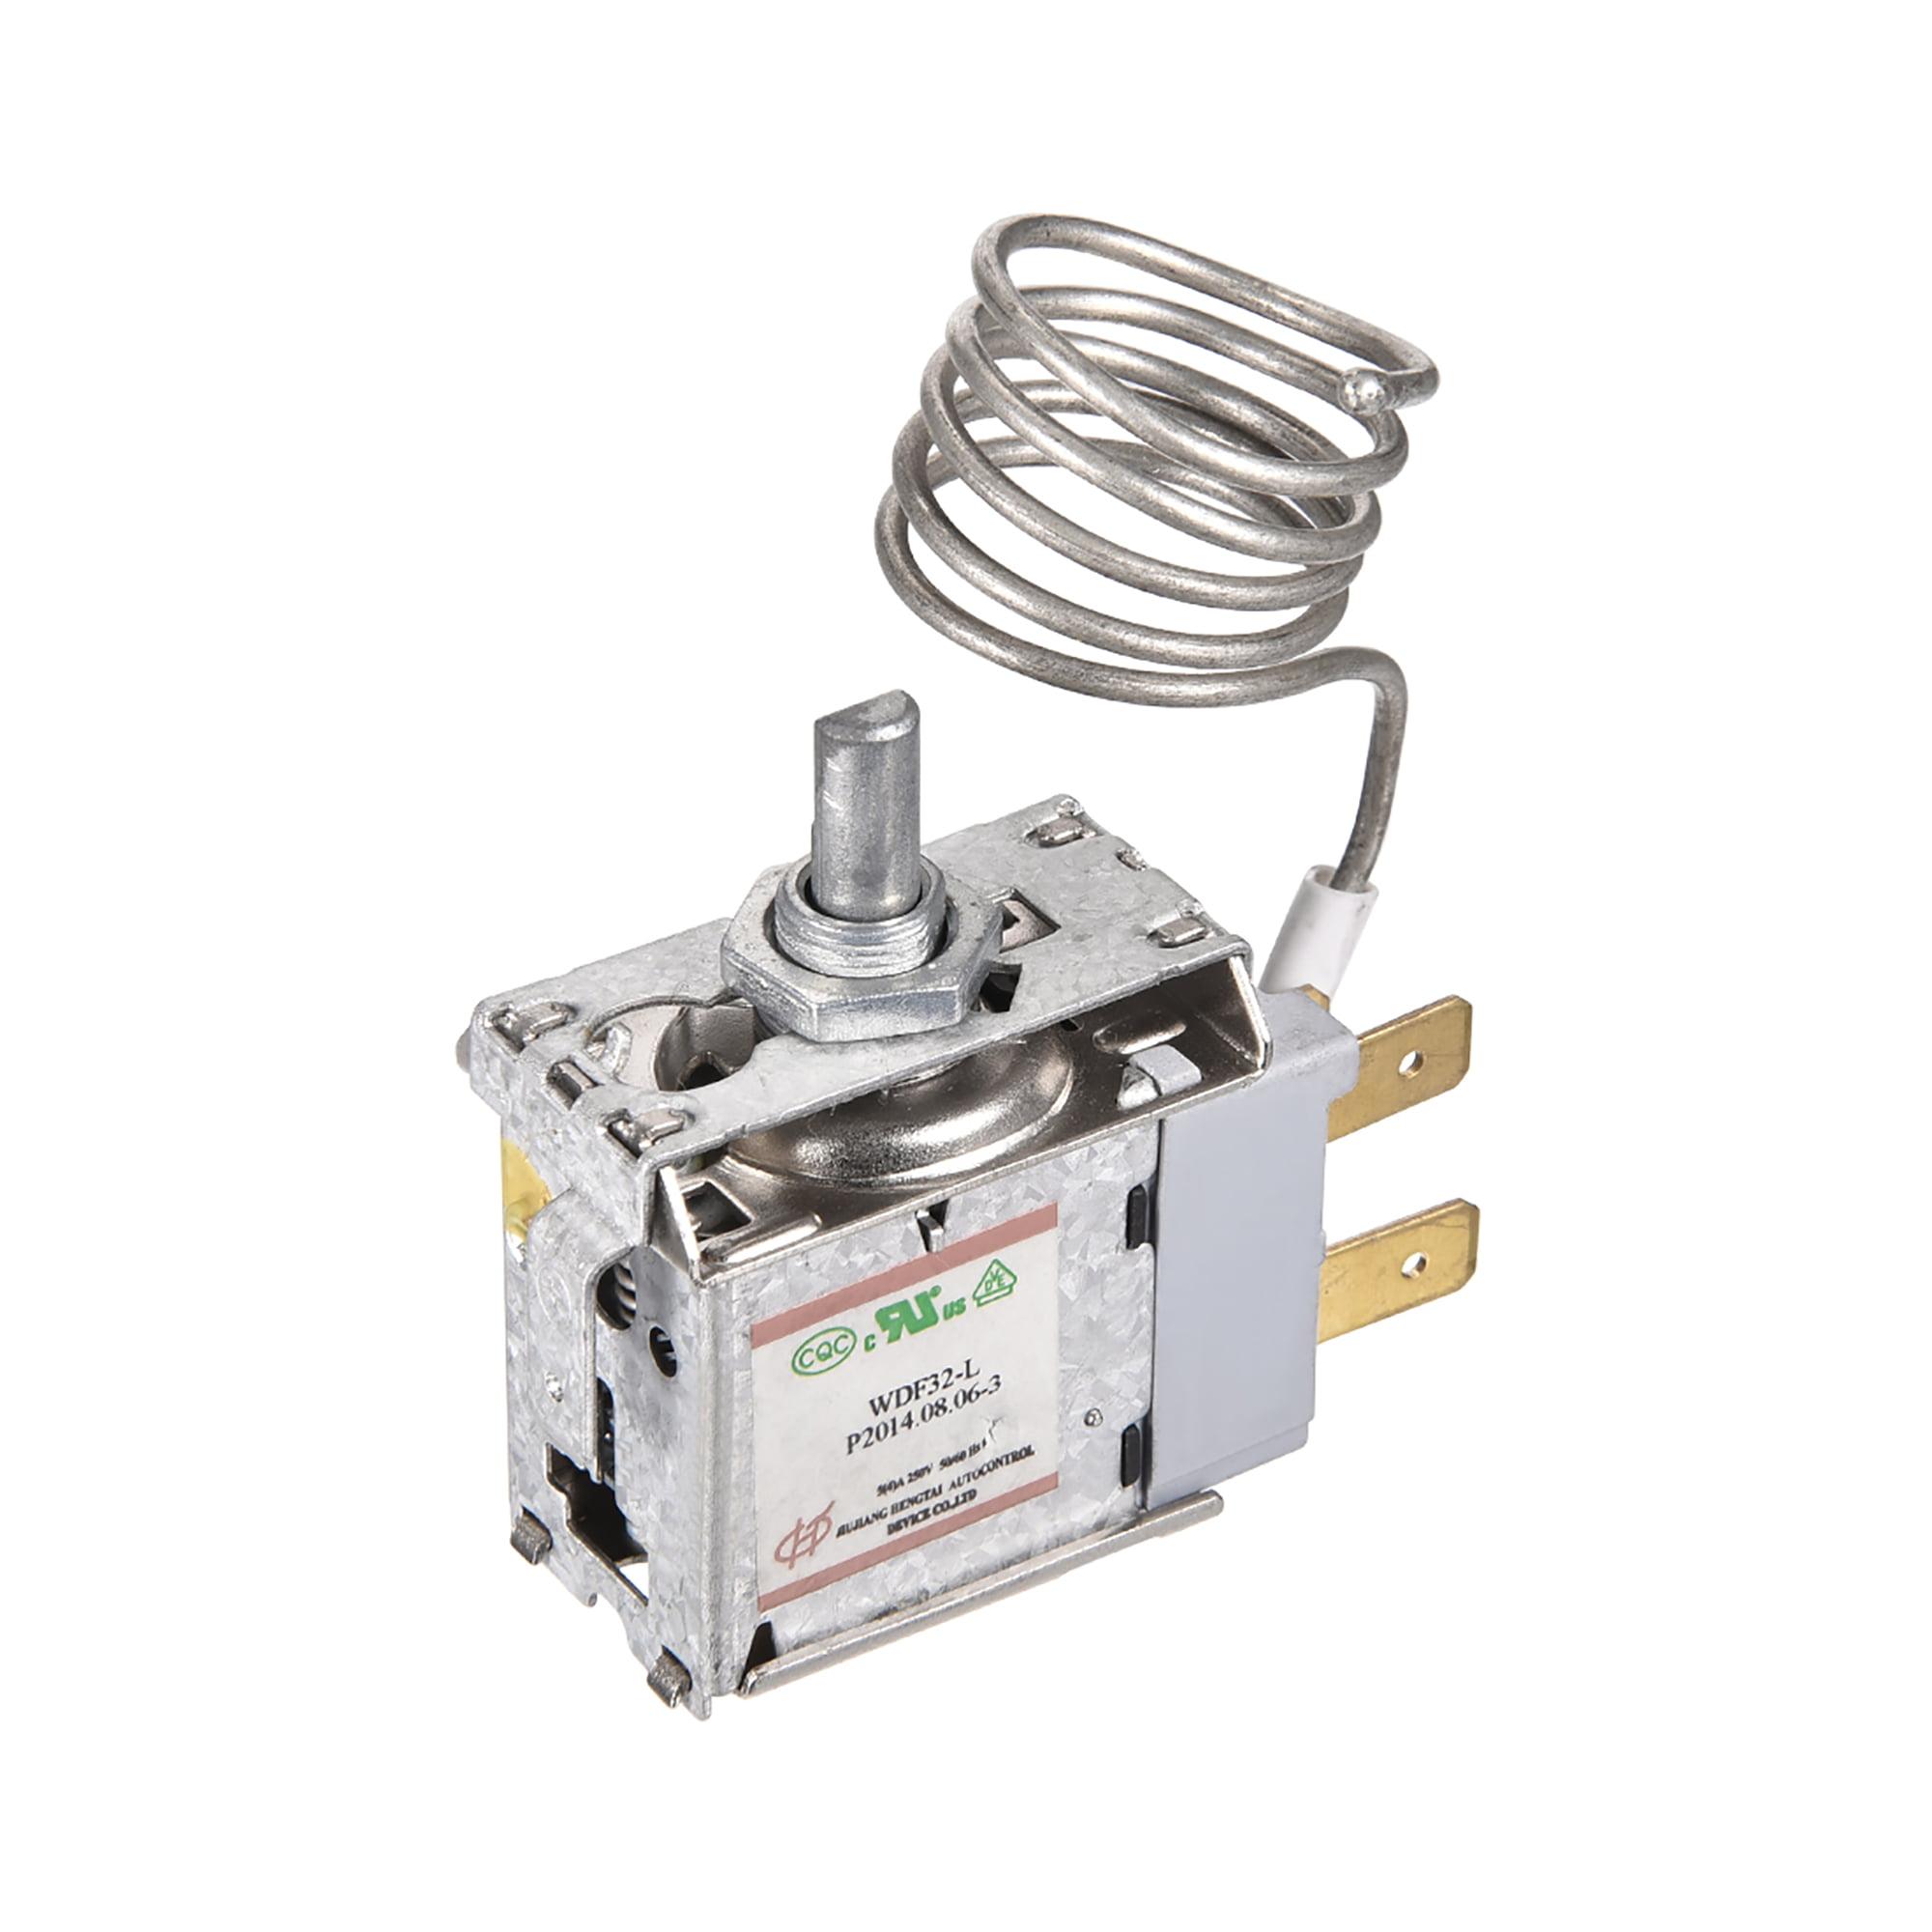 Refrigerator Thermostat Cord Freezer Refrigeration Temperature Controller 3 Pin 5(4)A